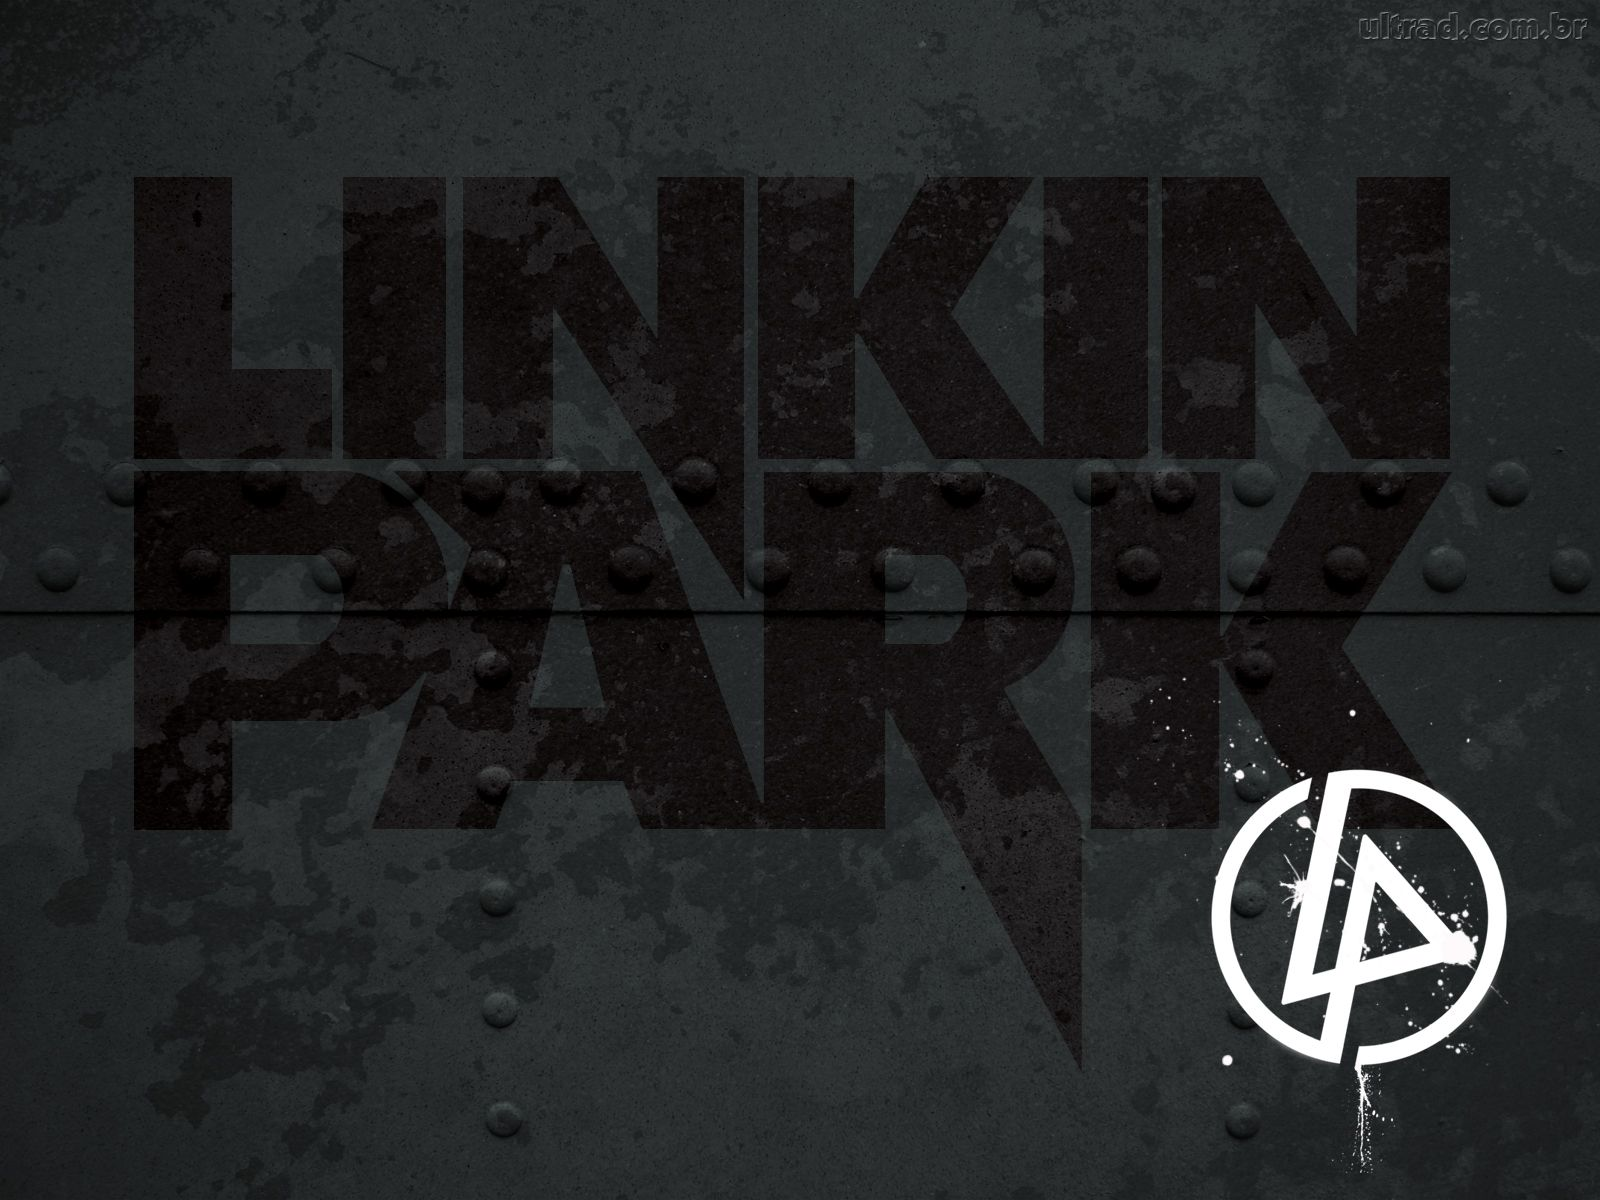 Why Linkin Park Sucks